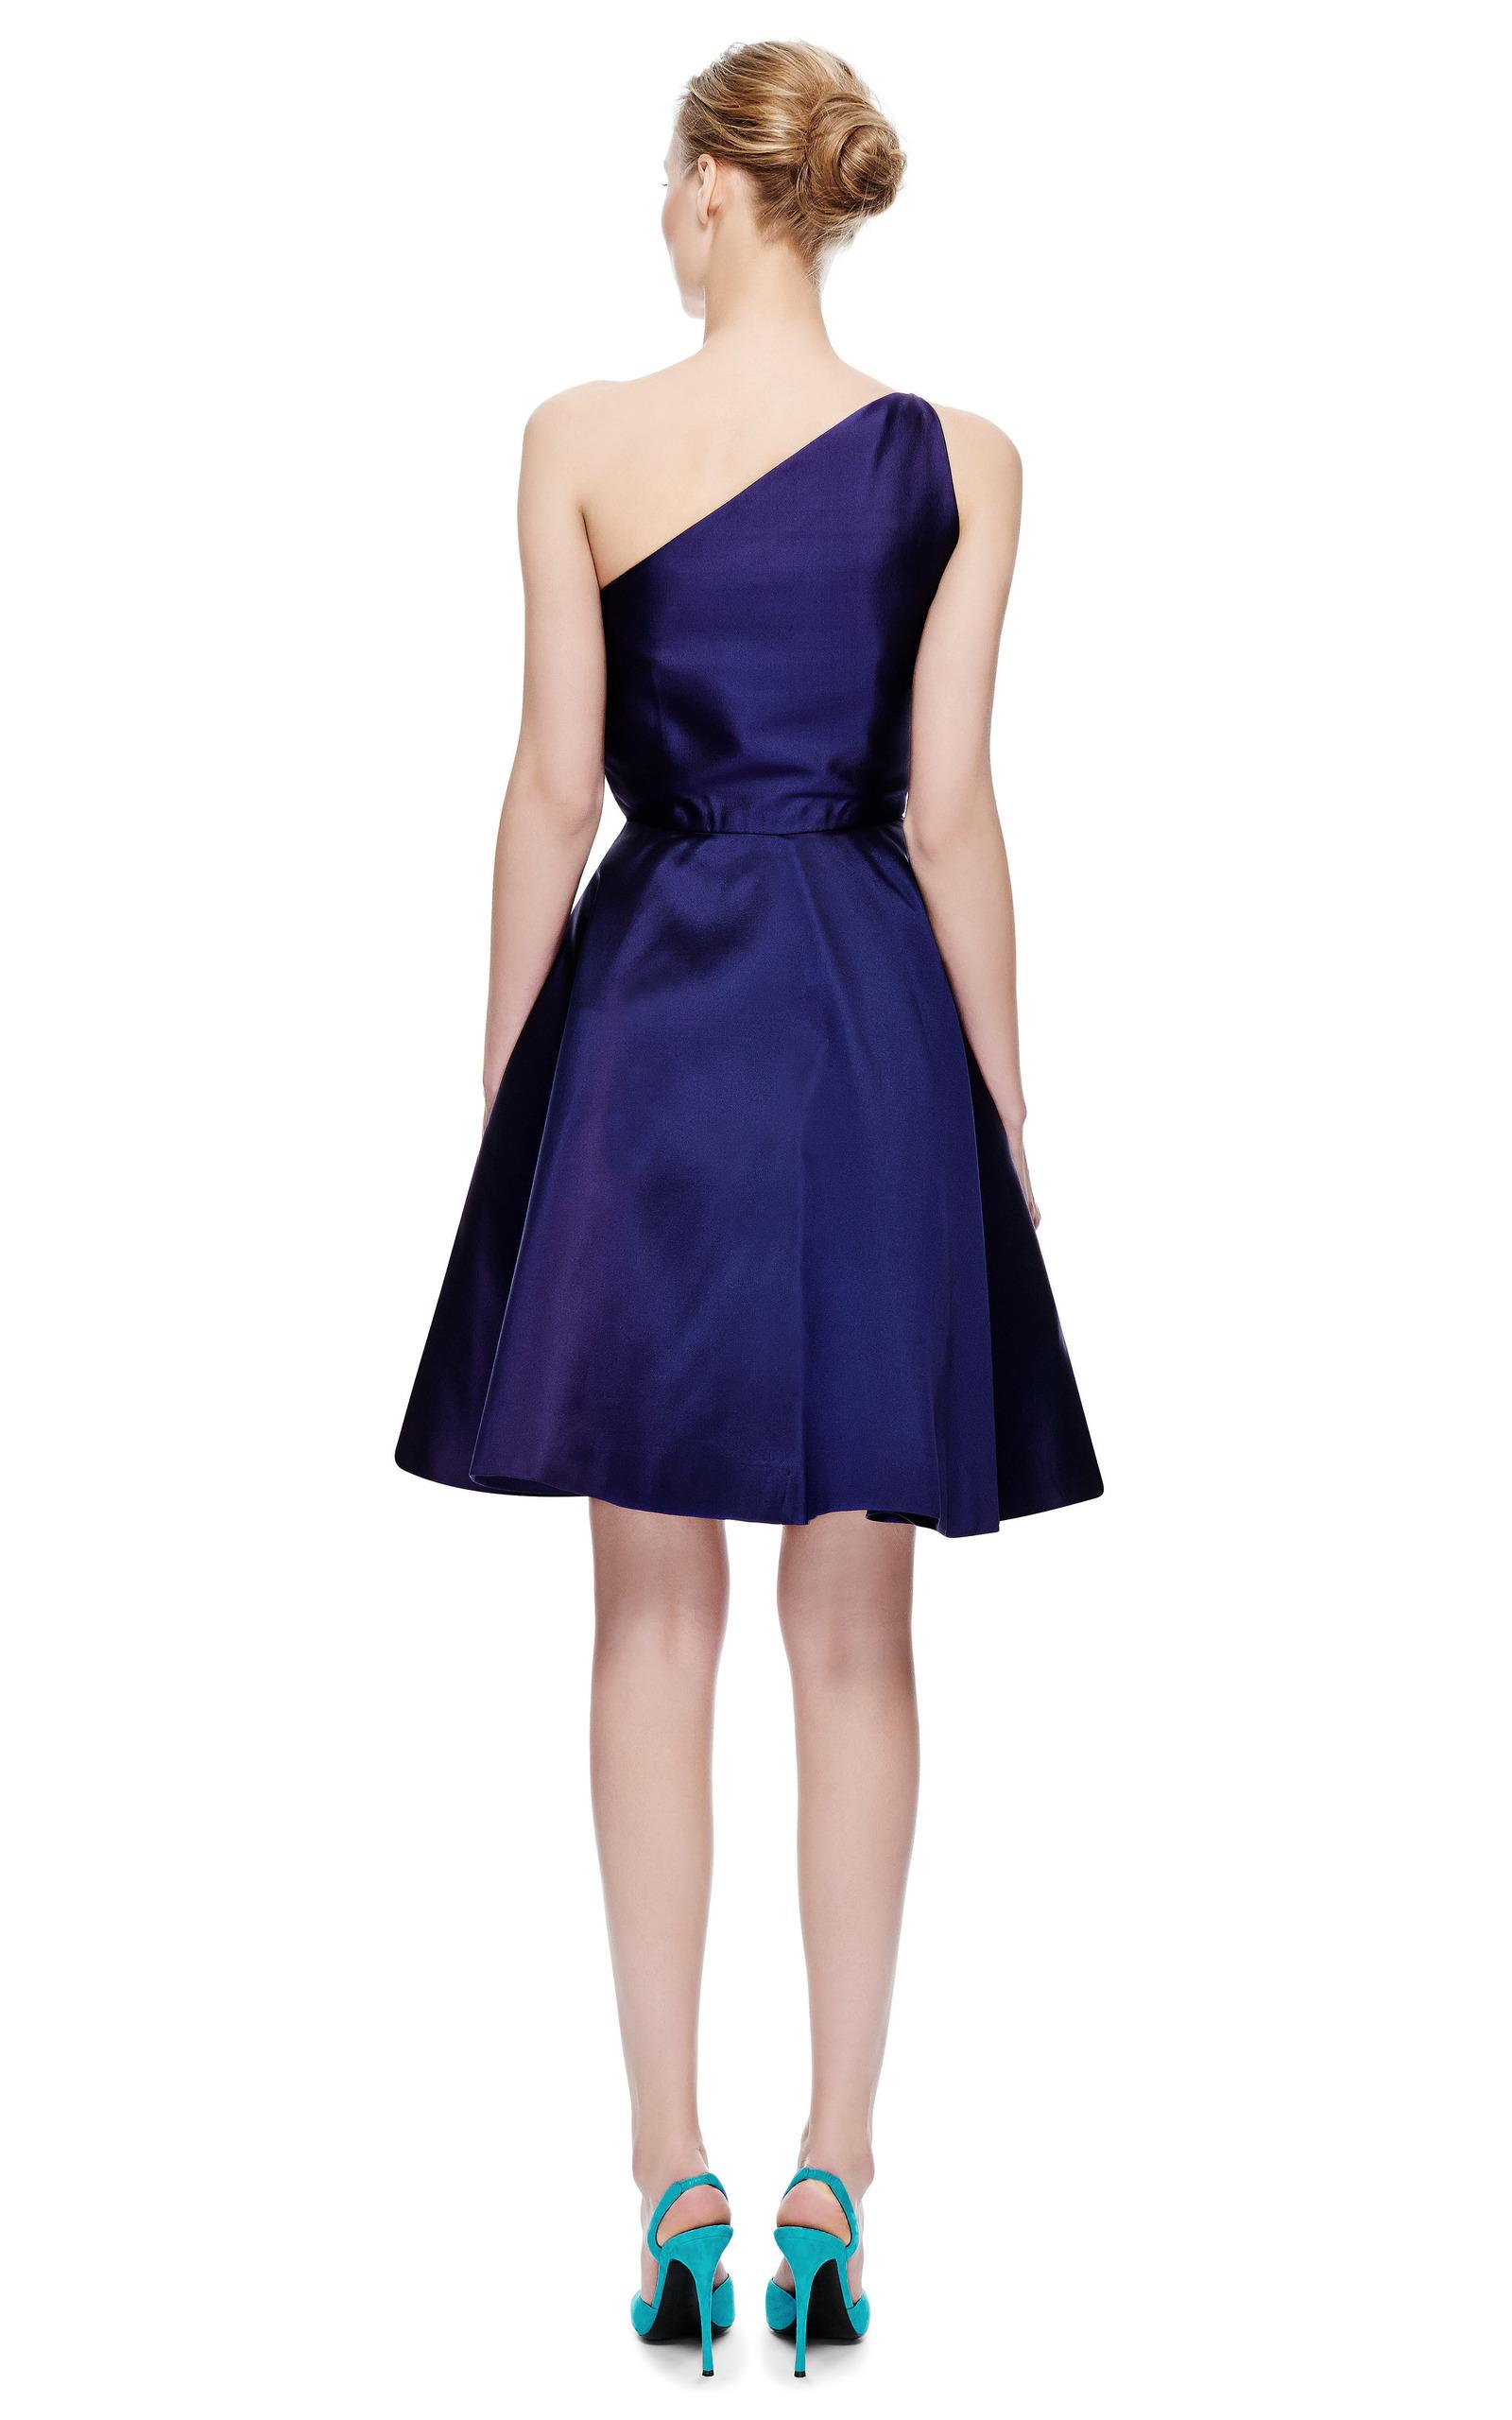 New York Vintage Carolyne Roehm Purple One Shoulder Cocktail Dress ...